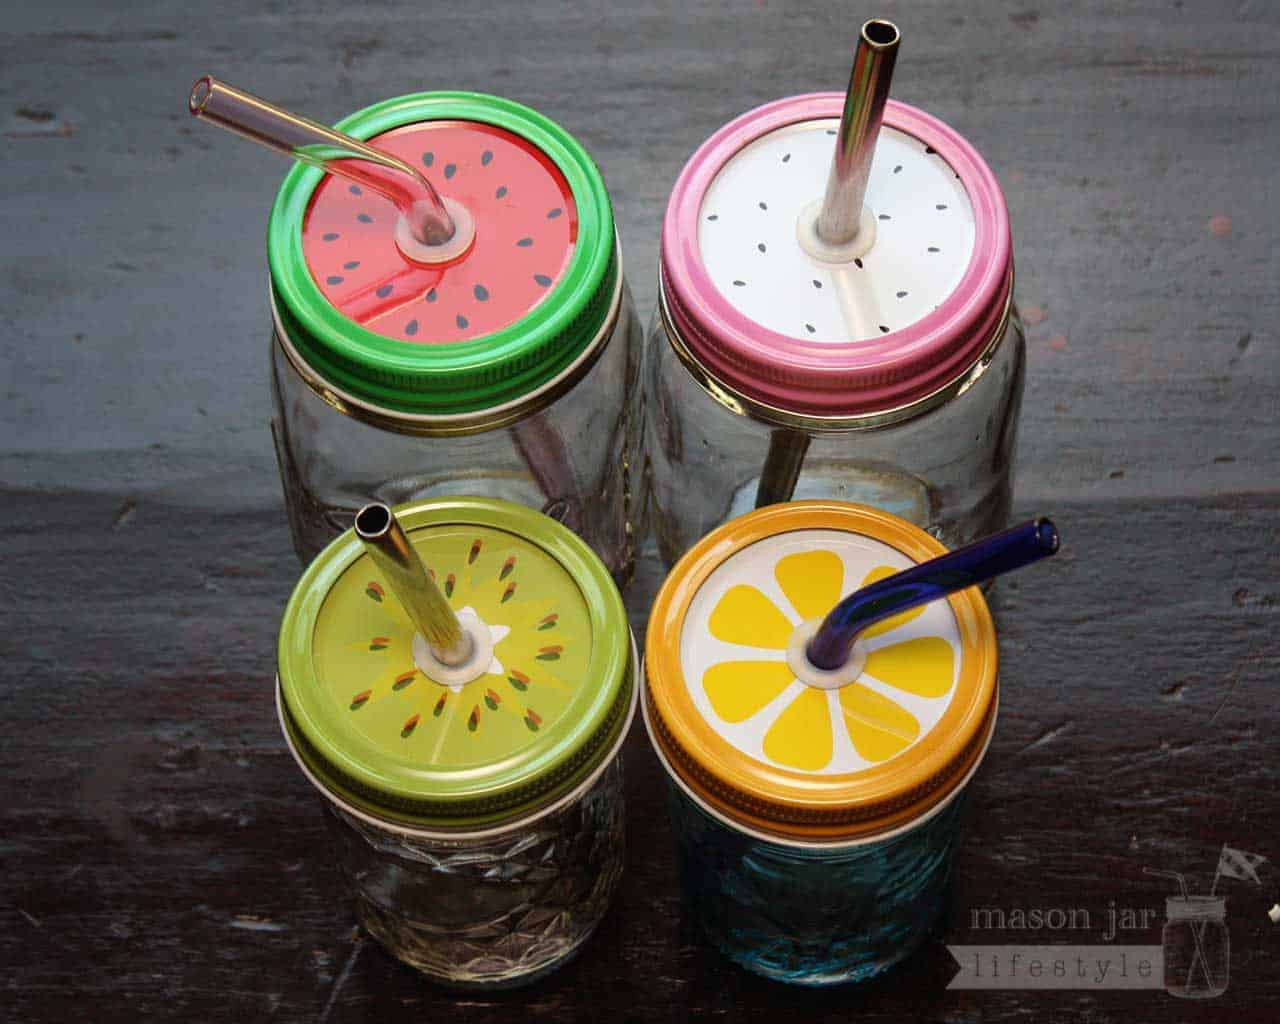 Fruit Straw Hole Tumbler Lids For Regular Mouth Mason Jars